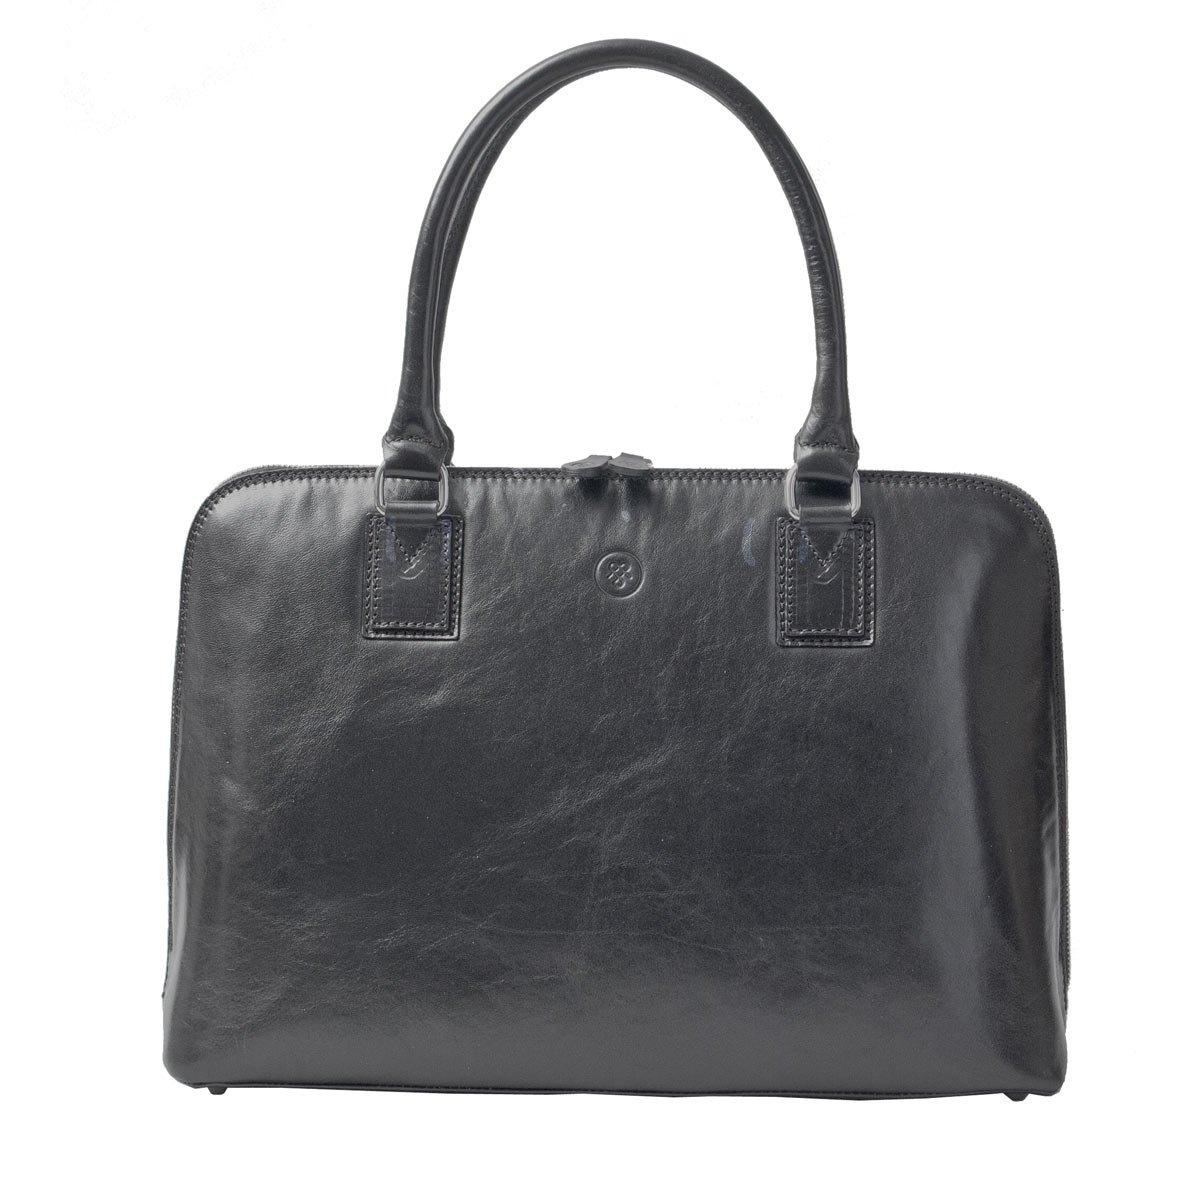 Maxwell Scott Luxury Ladies Black Leather Work Bag Purse for Macbook (Fiorella) by Maxwell Scott Bags (Image #1)